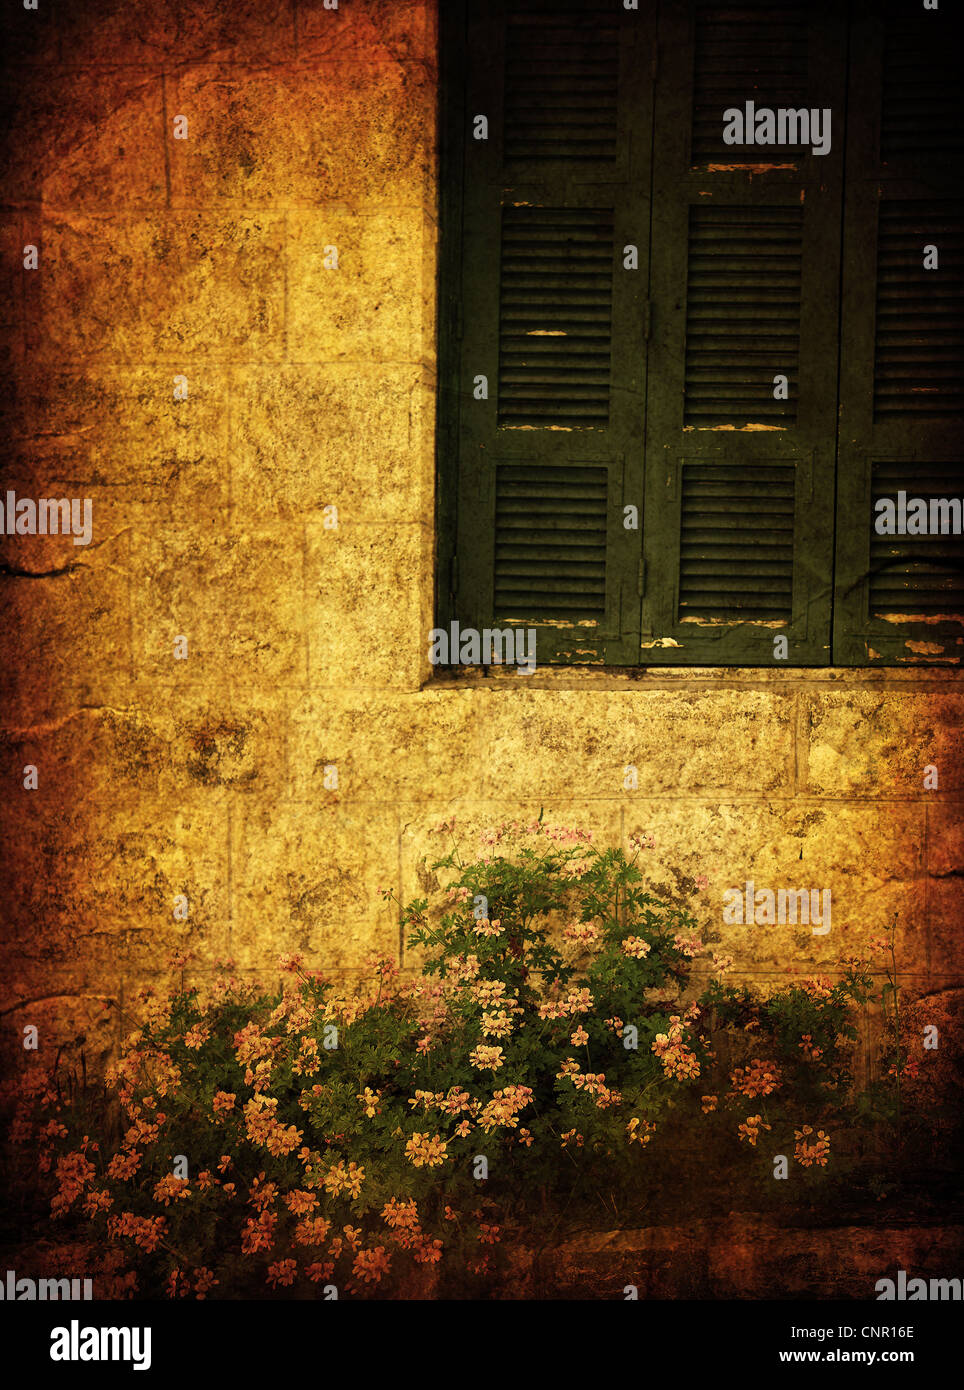 Old house grunge photo of window & flowers - Stock Image